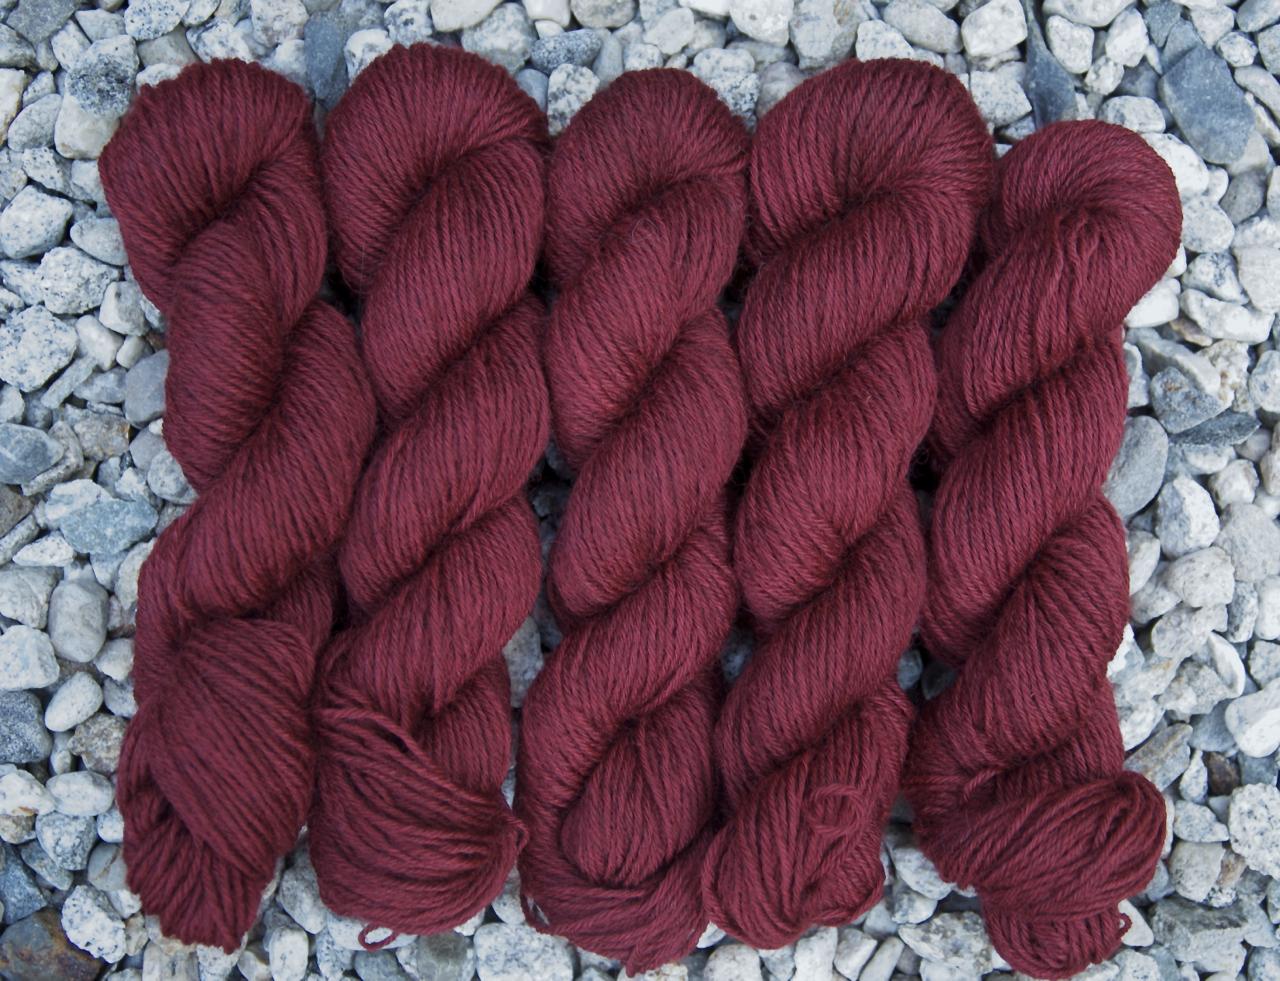 5 Ply Coopworth Gansey Yarn in Pomegranate